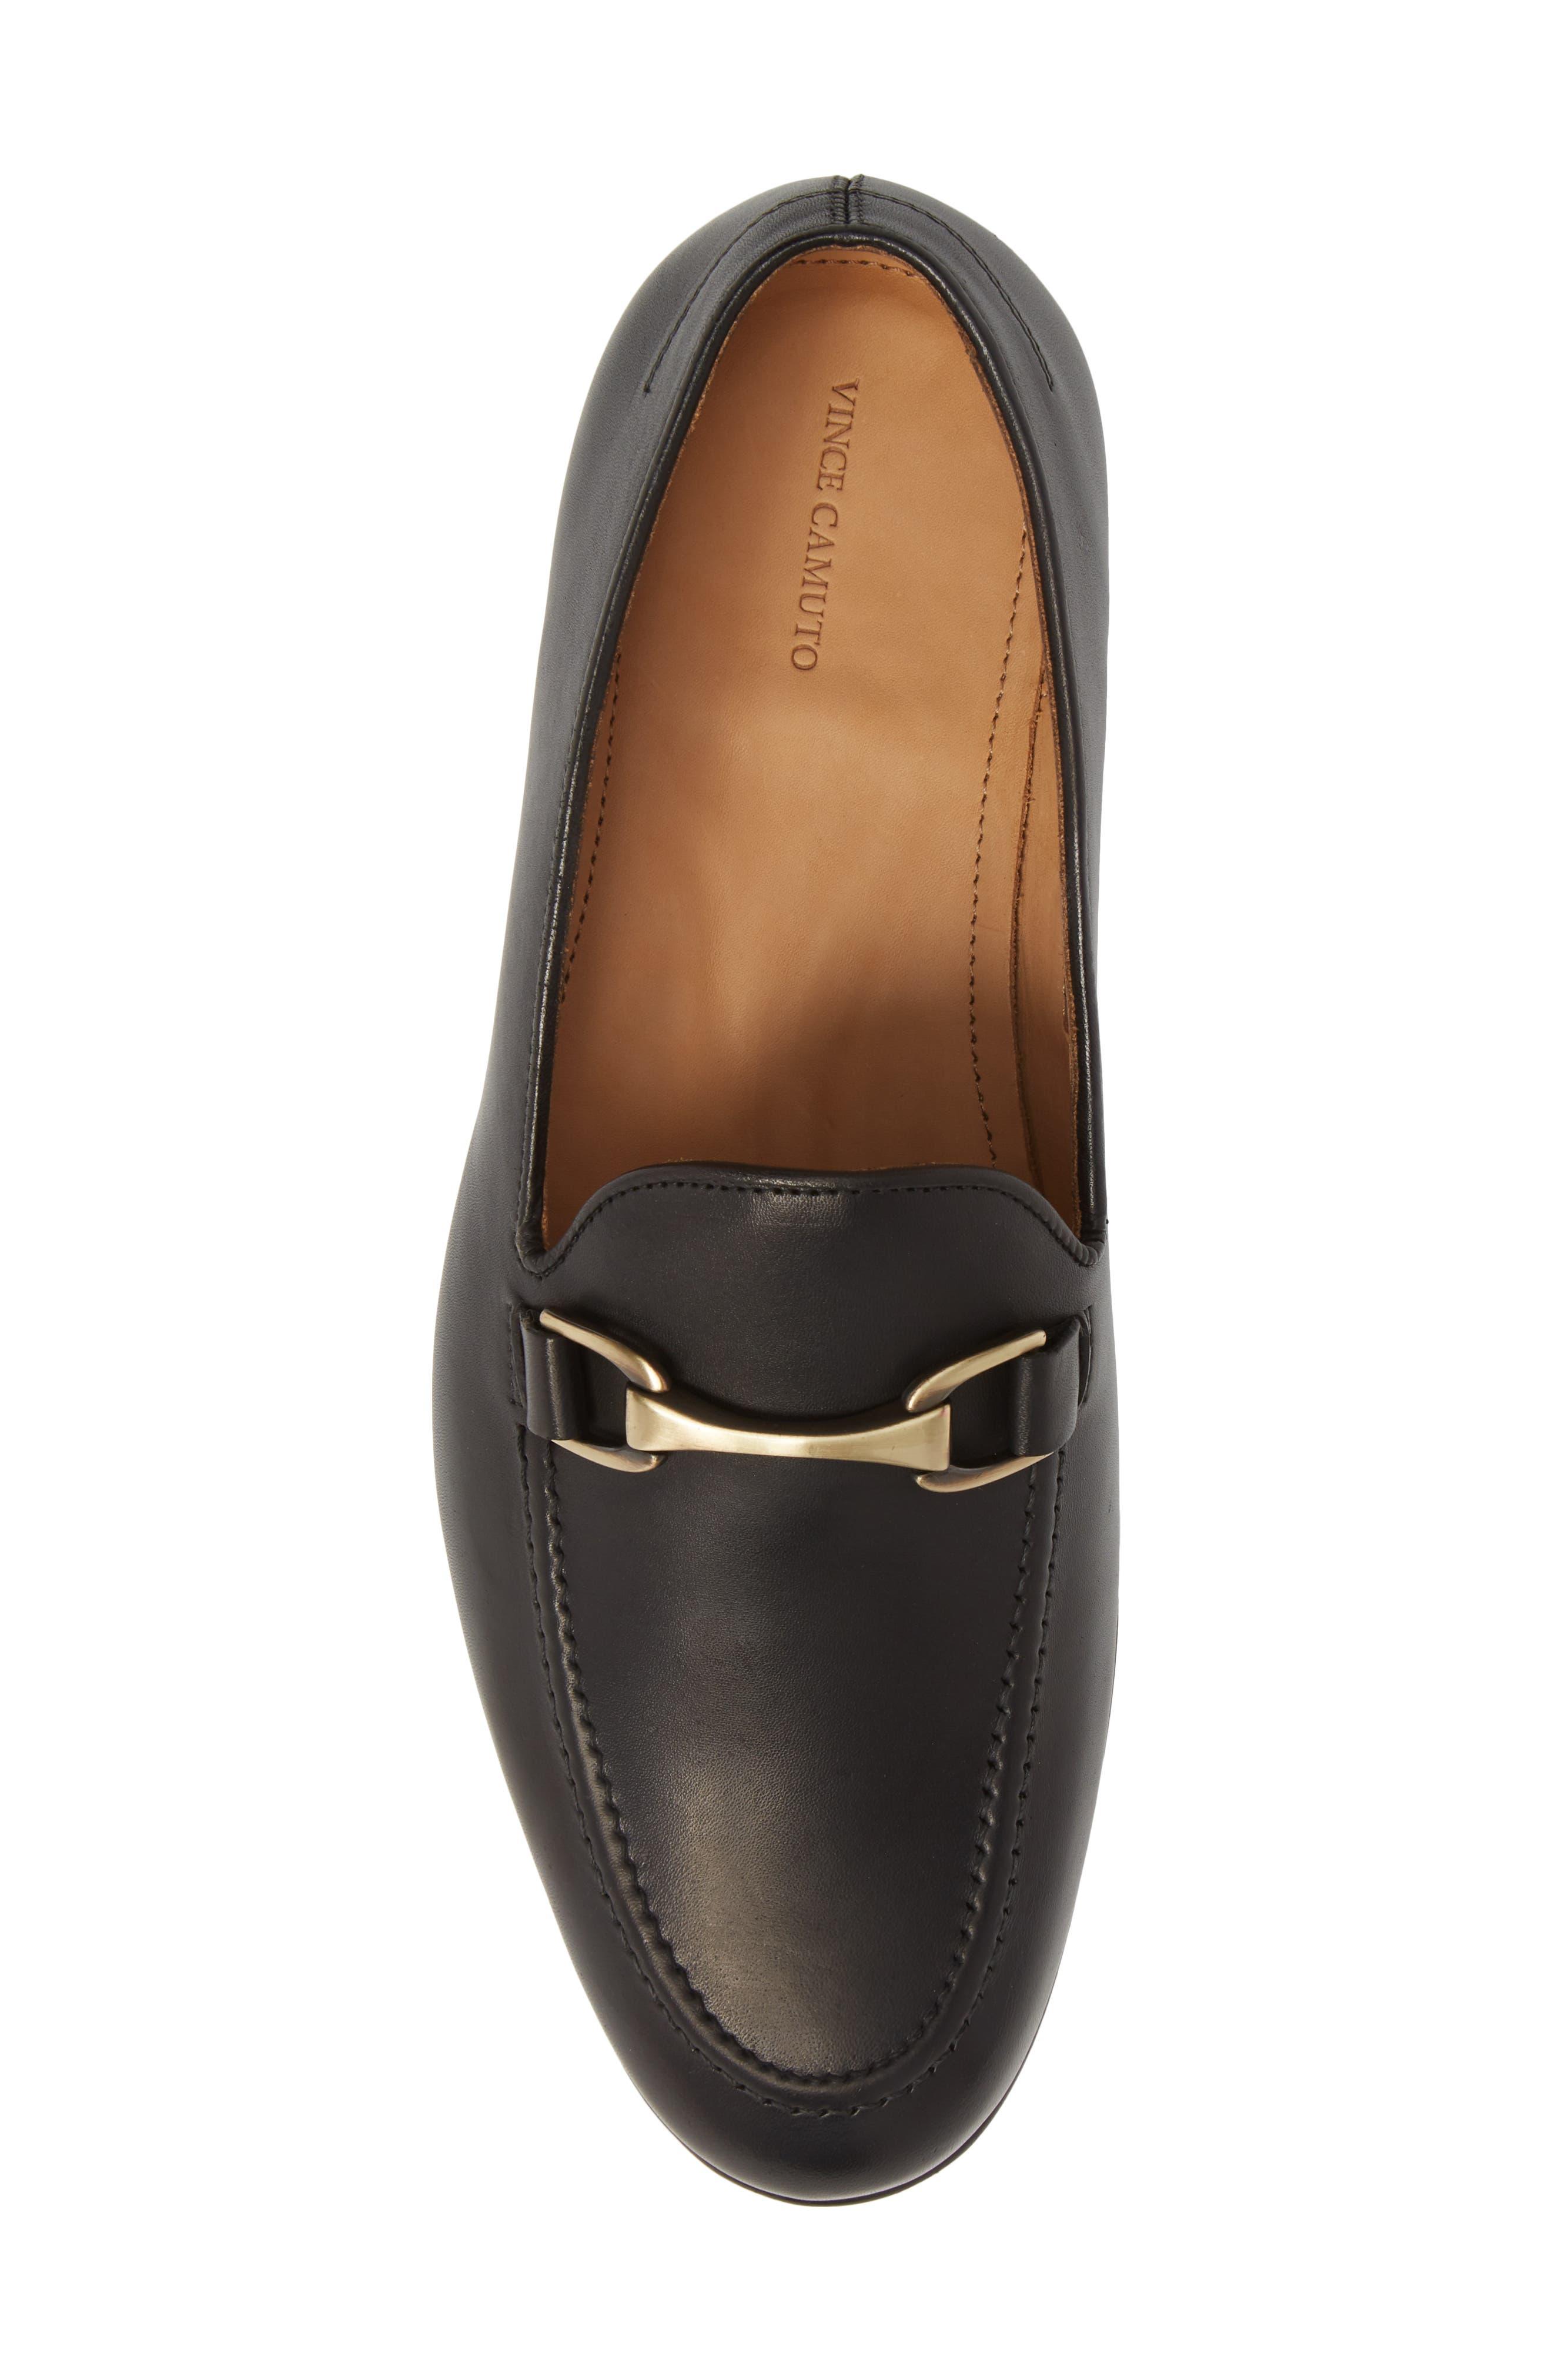 'Borcelo' Bit Loafer,                             Alternate thumbnail 5, color,                             Black Leather